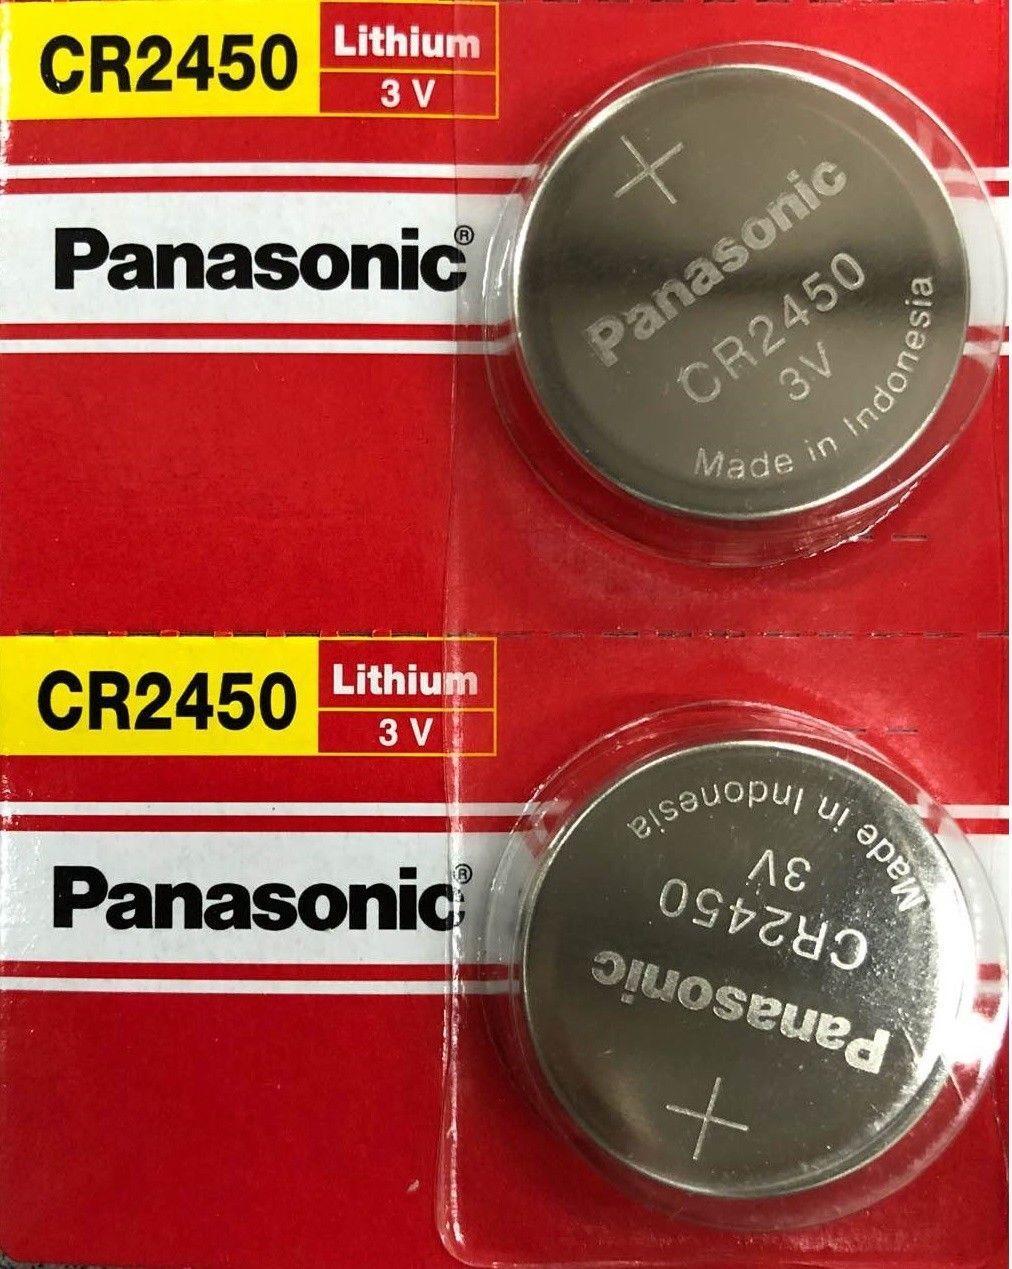 2 x Fresh New Panasonic CR2450 ECR 2450 3v LITHIUM Coin Cell Battery Exp. 2030 Consumer Electronics